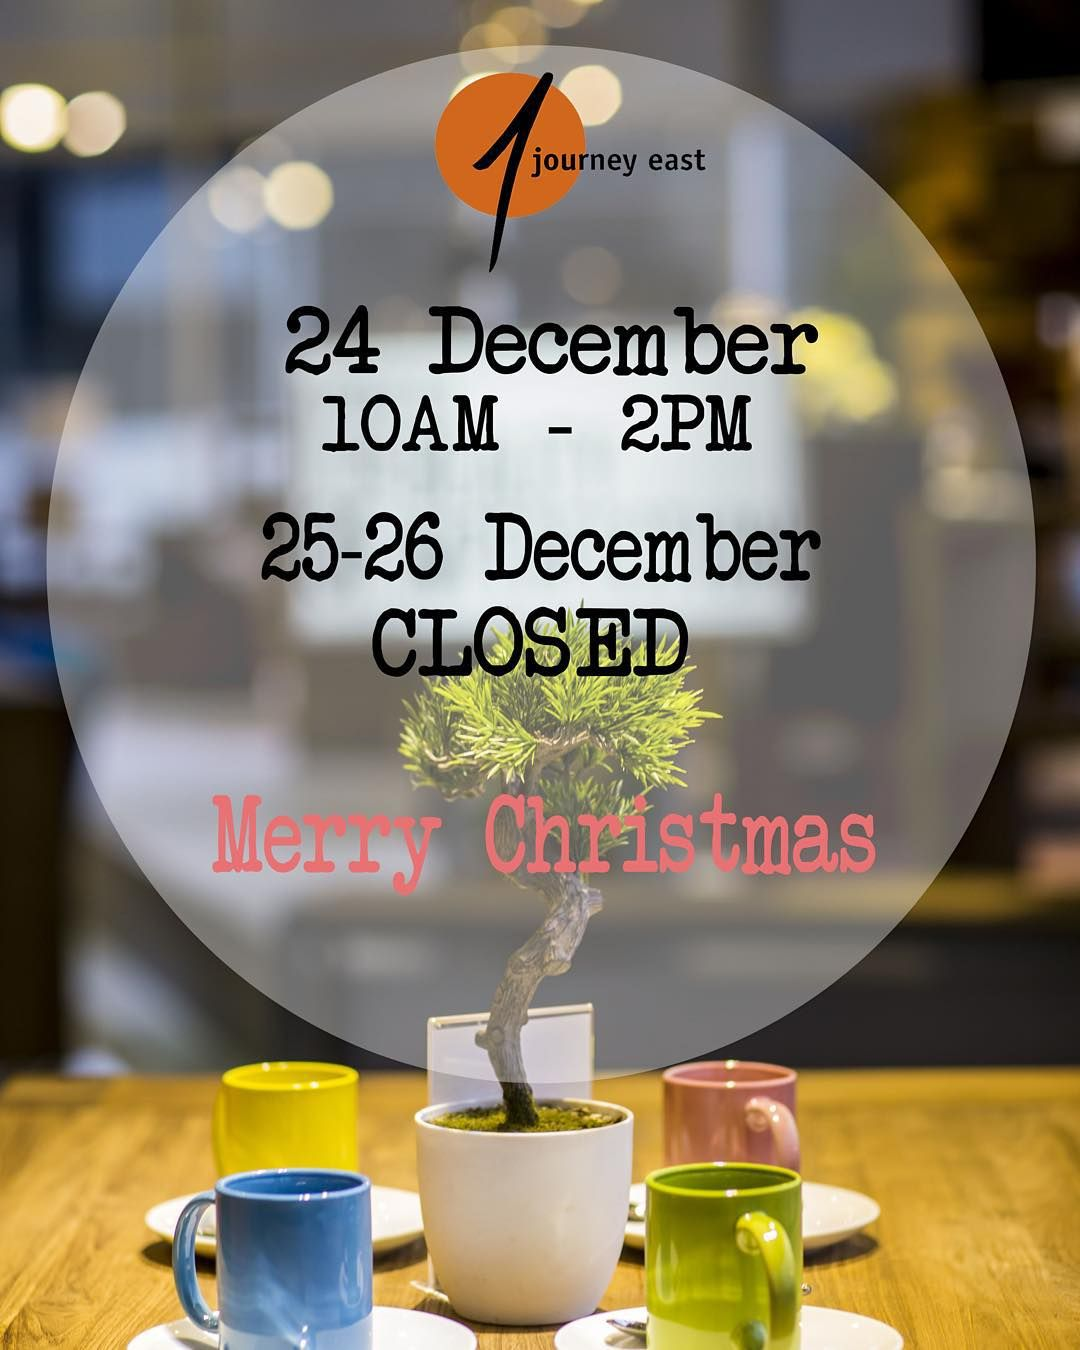 On instagram by journeyeastkk  #homedesign #metsuke (o)  http://ift.tt/1mB8mOe  Yes it's Christmas! Still looking for christmas gift? Please drop by at @journeyeastkk we are open today till 2pm. #merrychristmas #kotakinabalu #sabahan #itschristmas #christmas2015 #christmastime #teakwood #interior